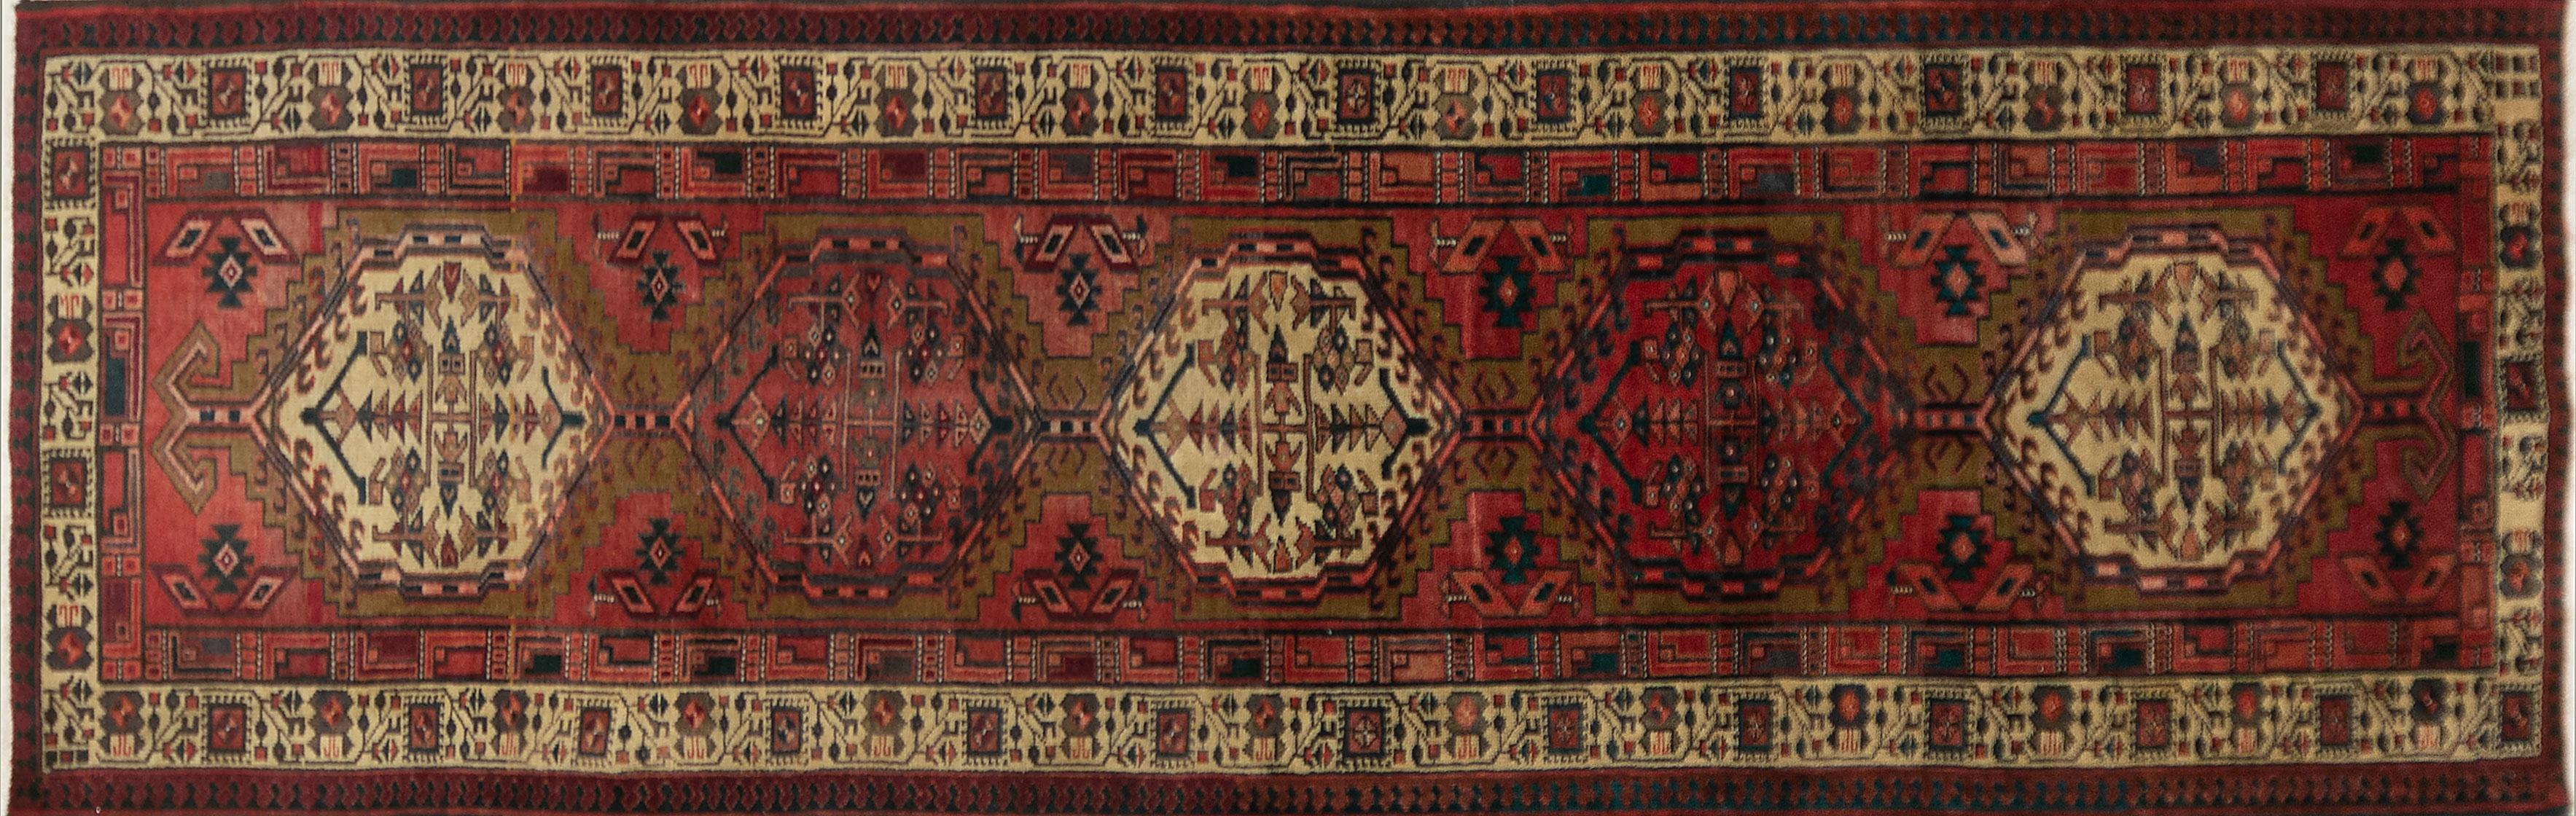 A Persian Hand Knotted Azari Runner, 330 x 100